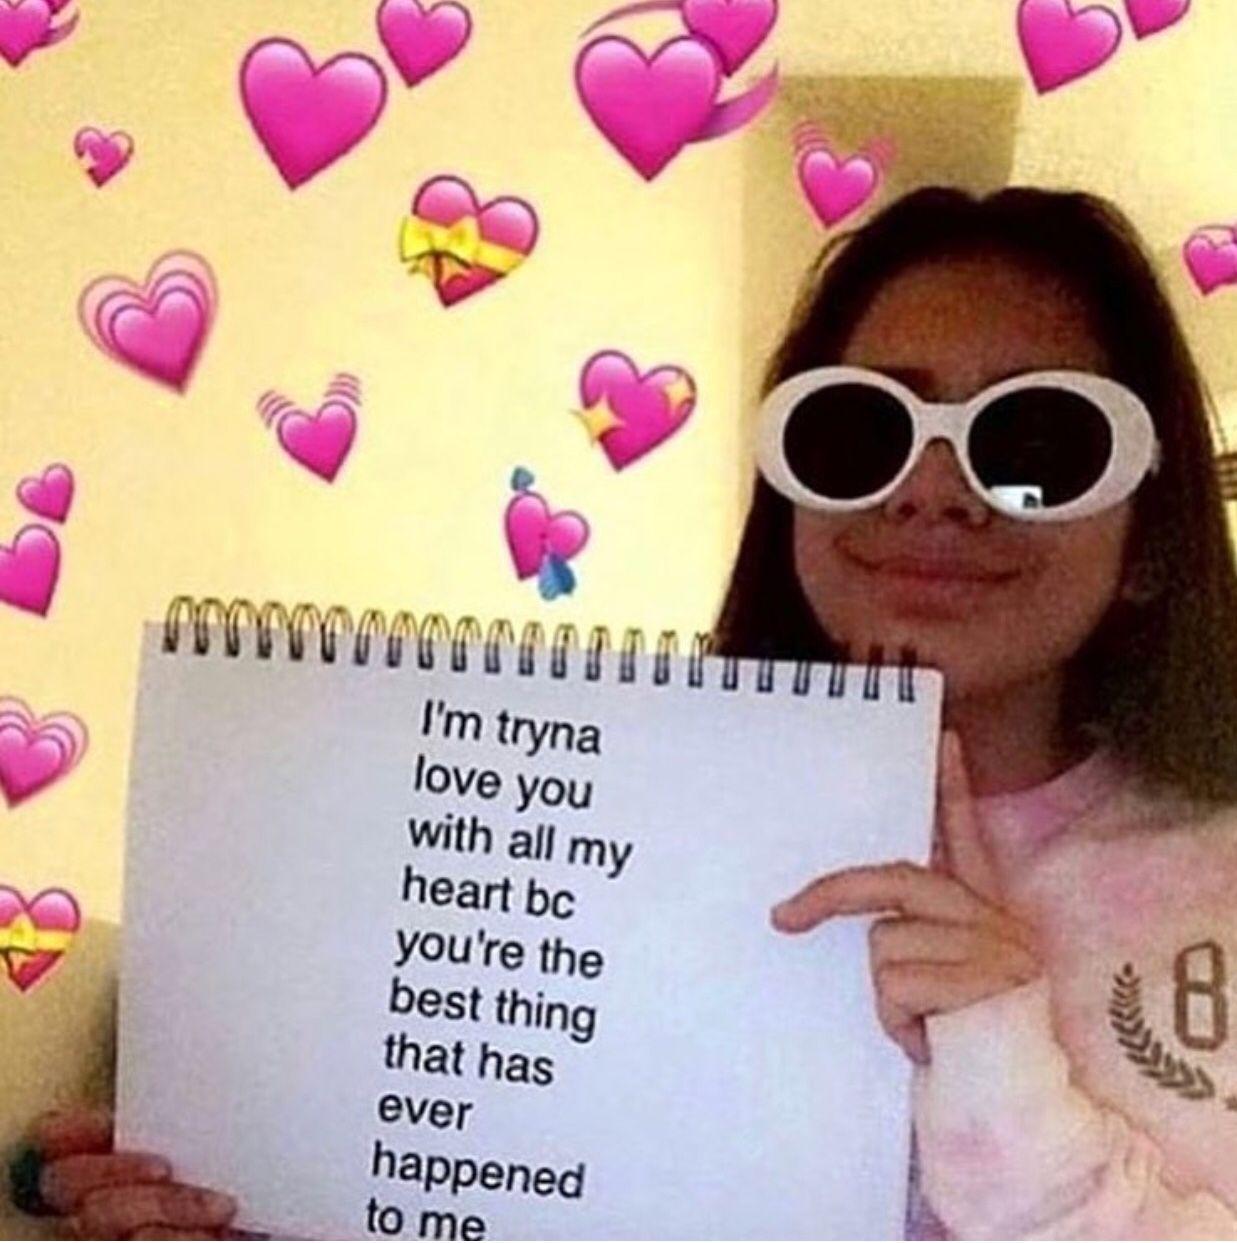 Cute love memes image by Aniyah Nelson on Feelings Love